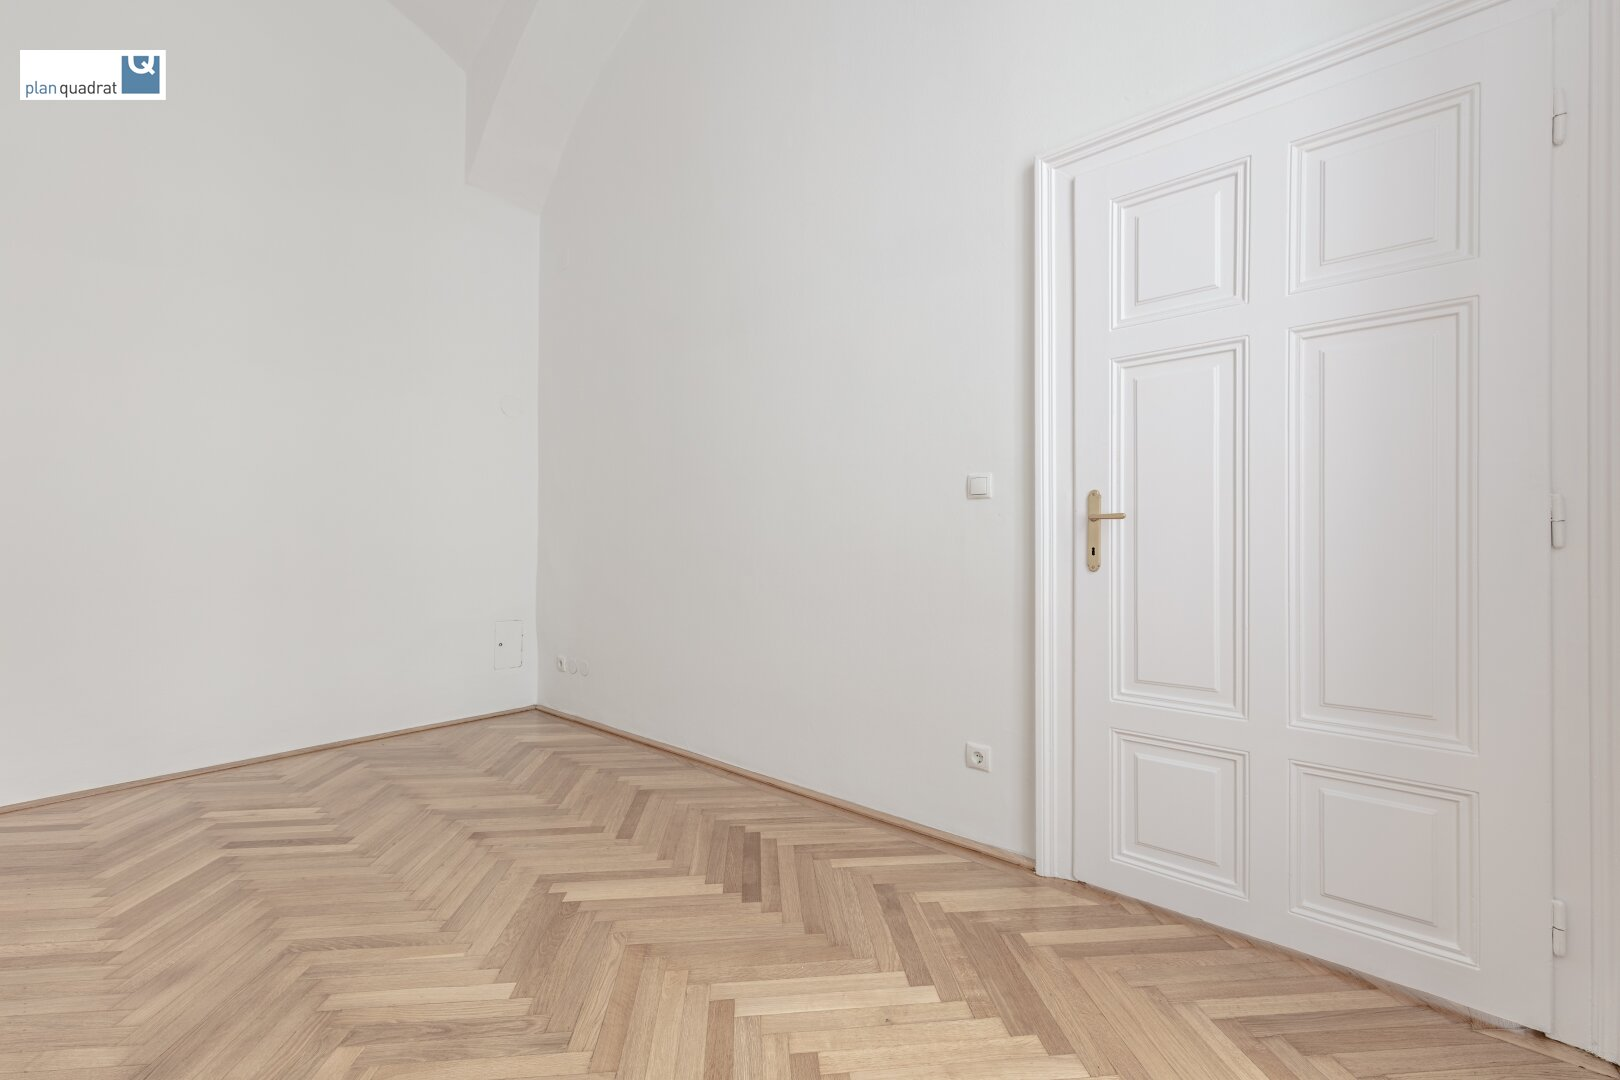 Zimmer 4 (ca. 12,80 m²) gem. Grundriss